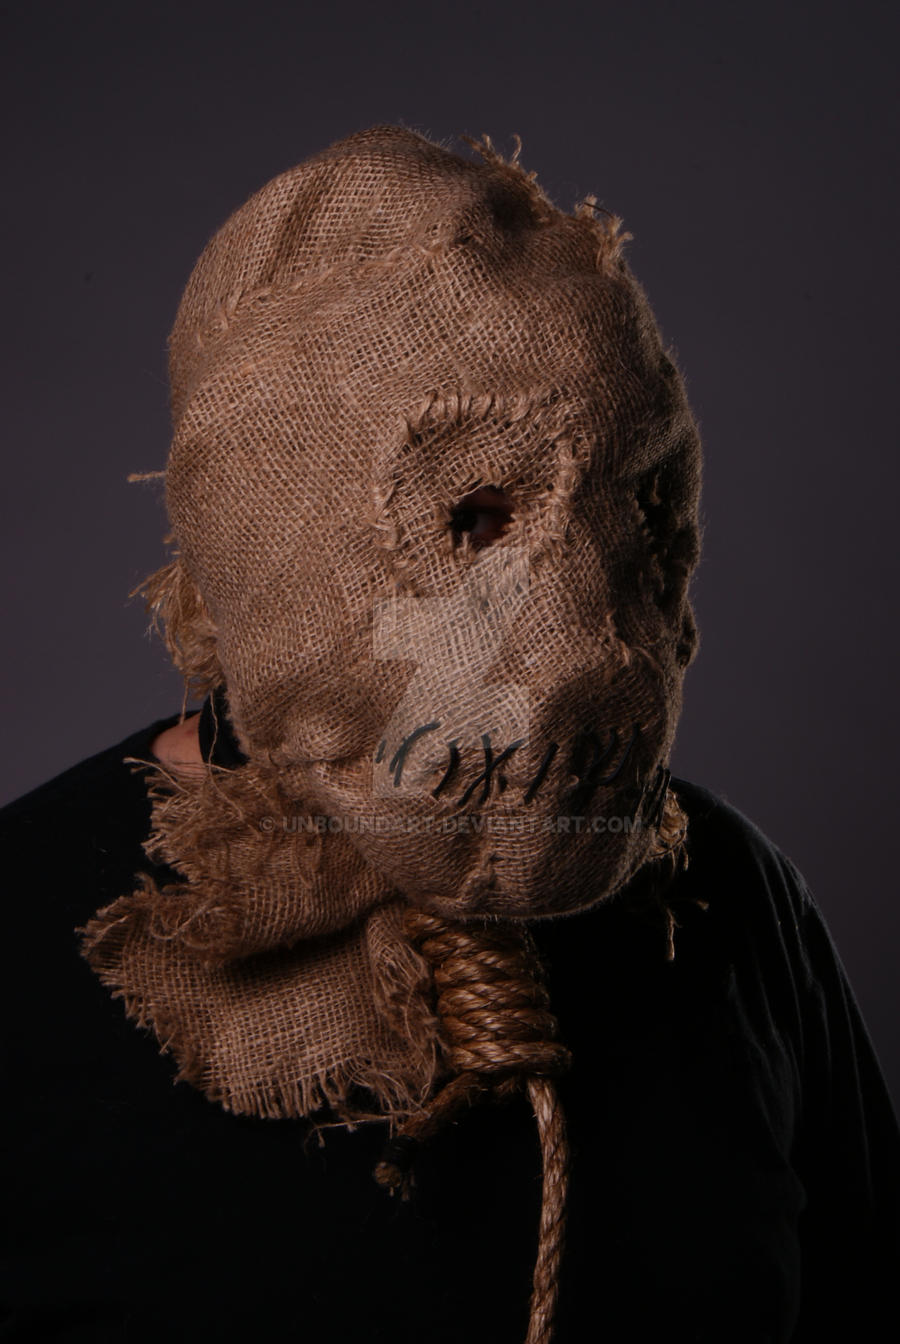 Batman Scarecrow mask replica by UnboundArt on DeviantArt